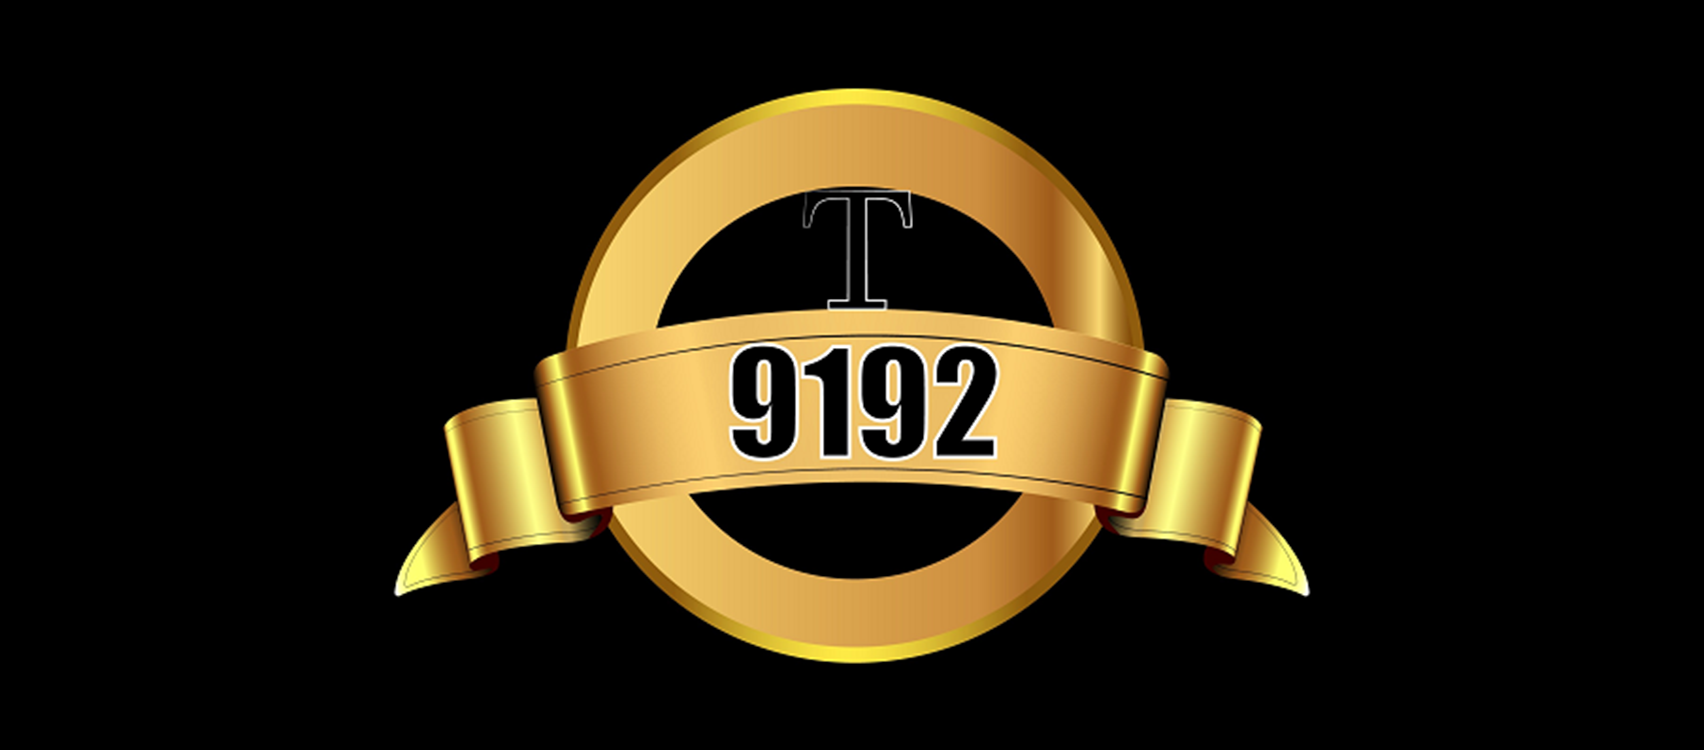 Таксі 9192  (Первомайськ,Київ,Одесса,Полтава,Херсон)